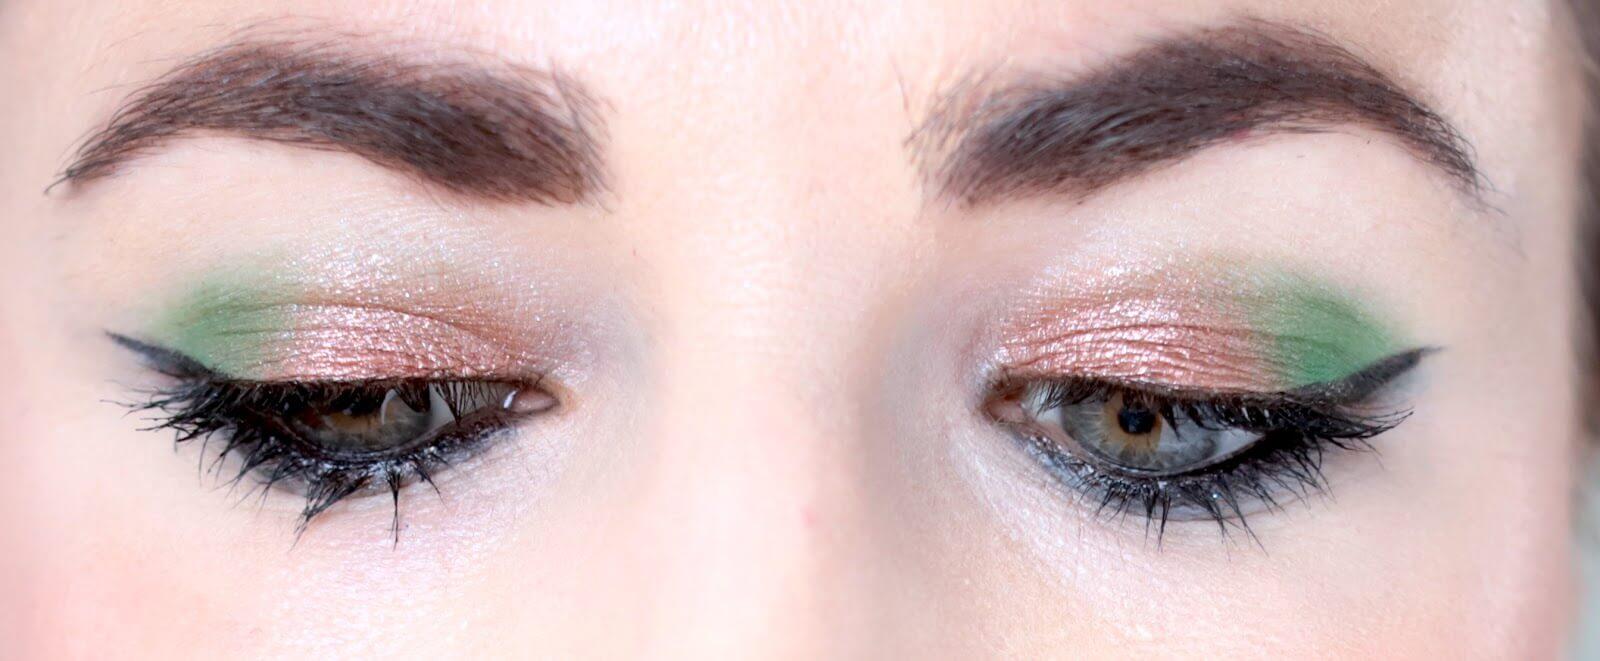 Le 9 de Givenchy 9.02 maquillage